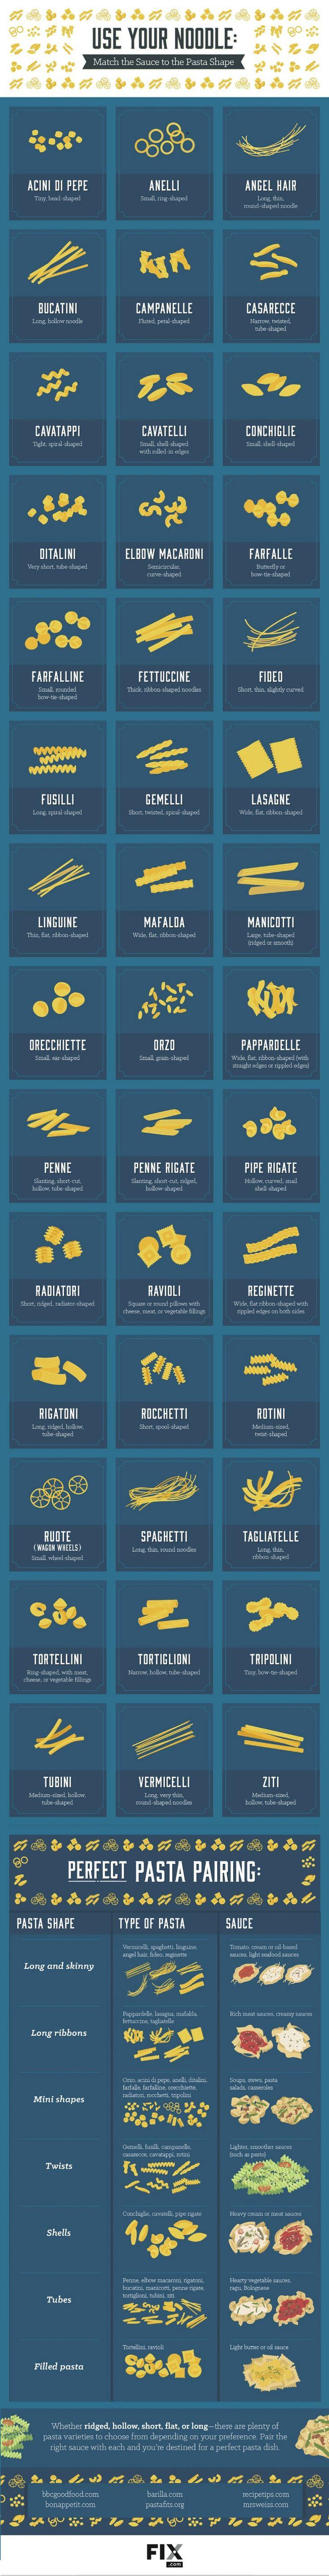 153 best COOKING TIPS images on Pinterest   Food tips, Baking hacks ...